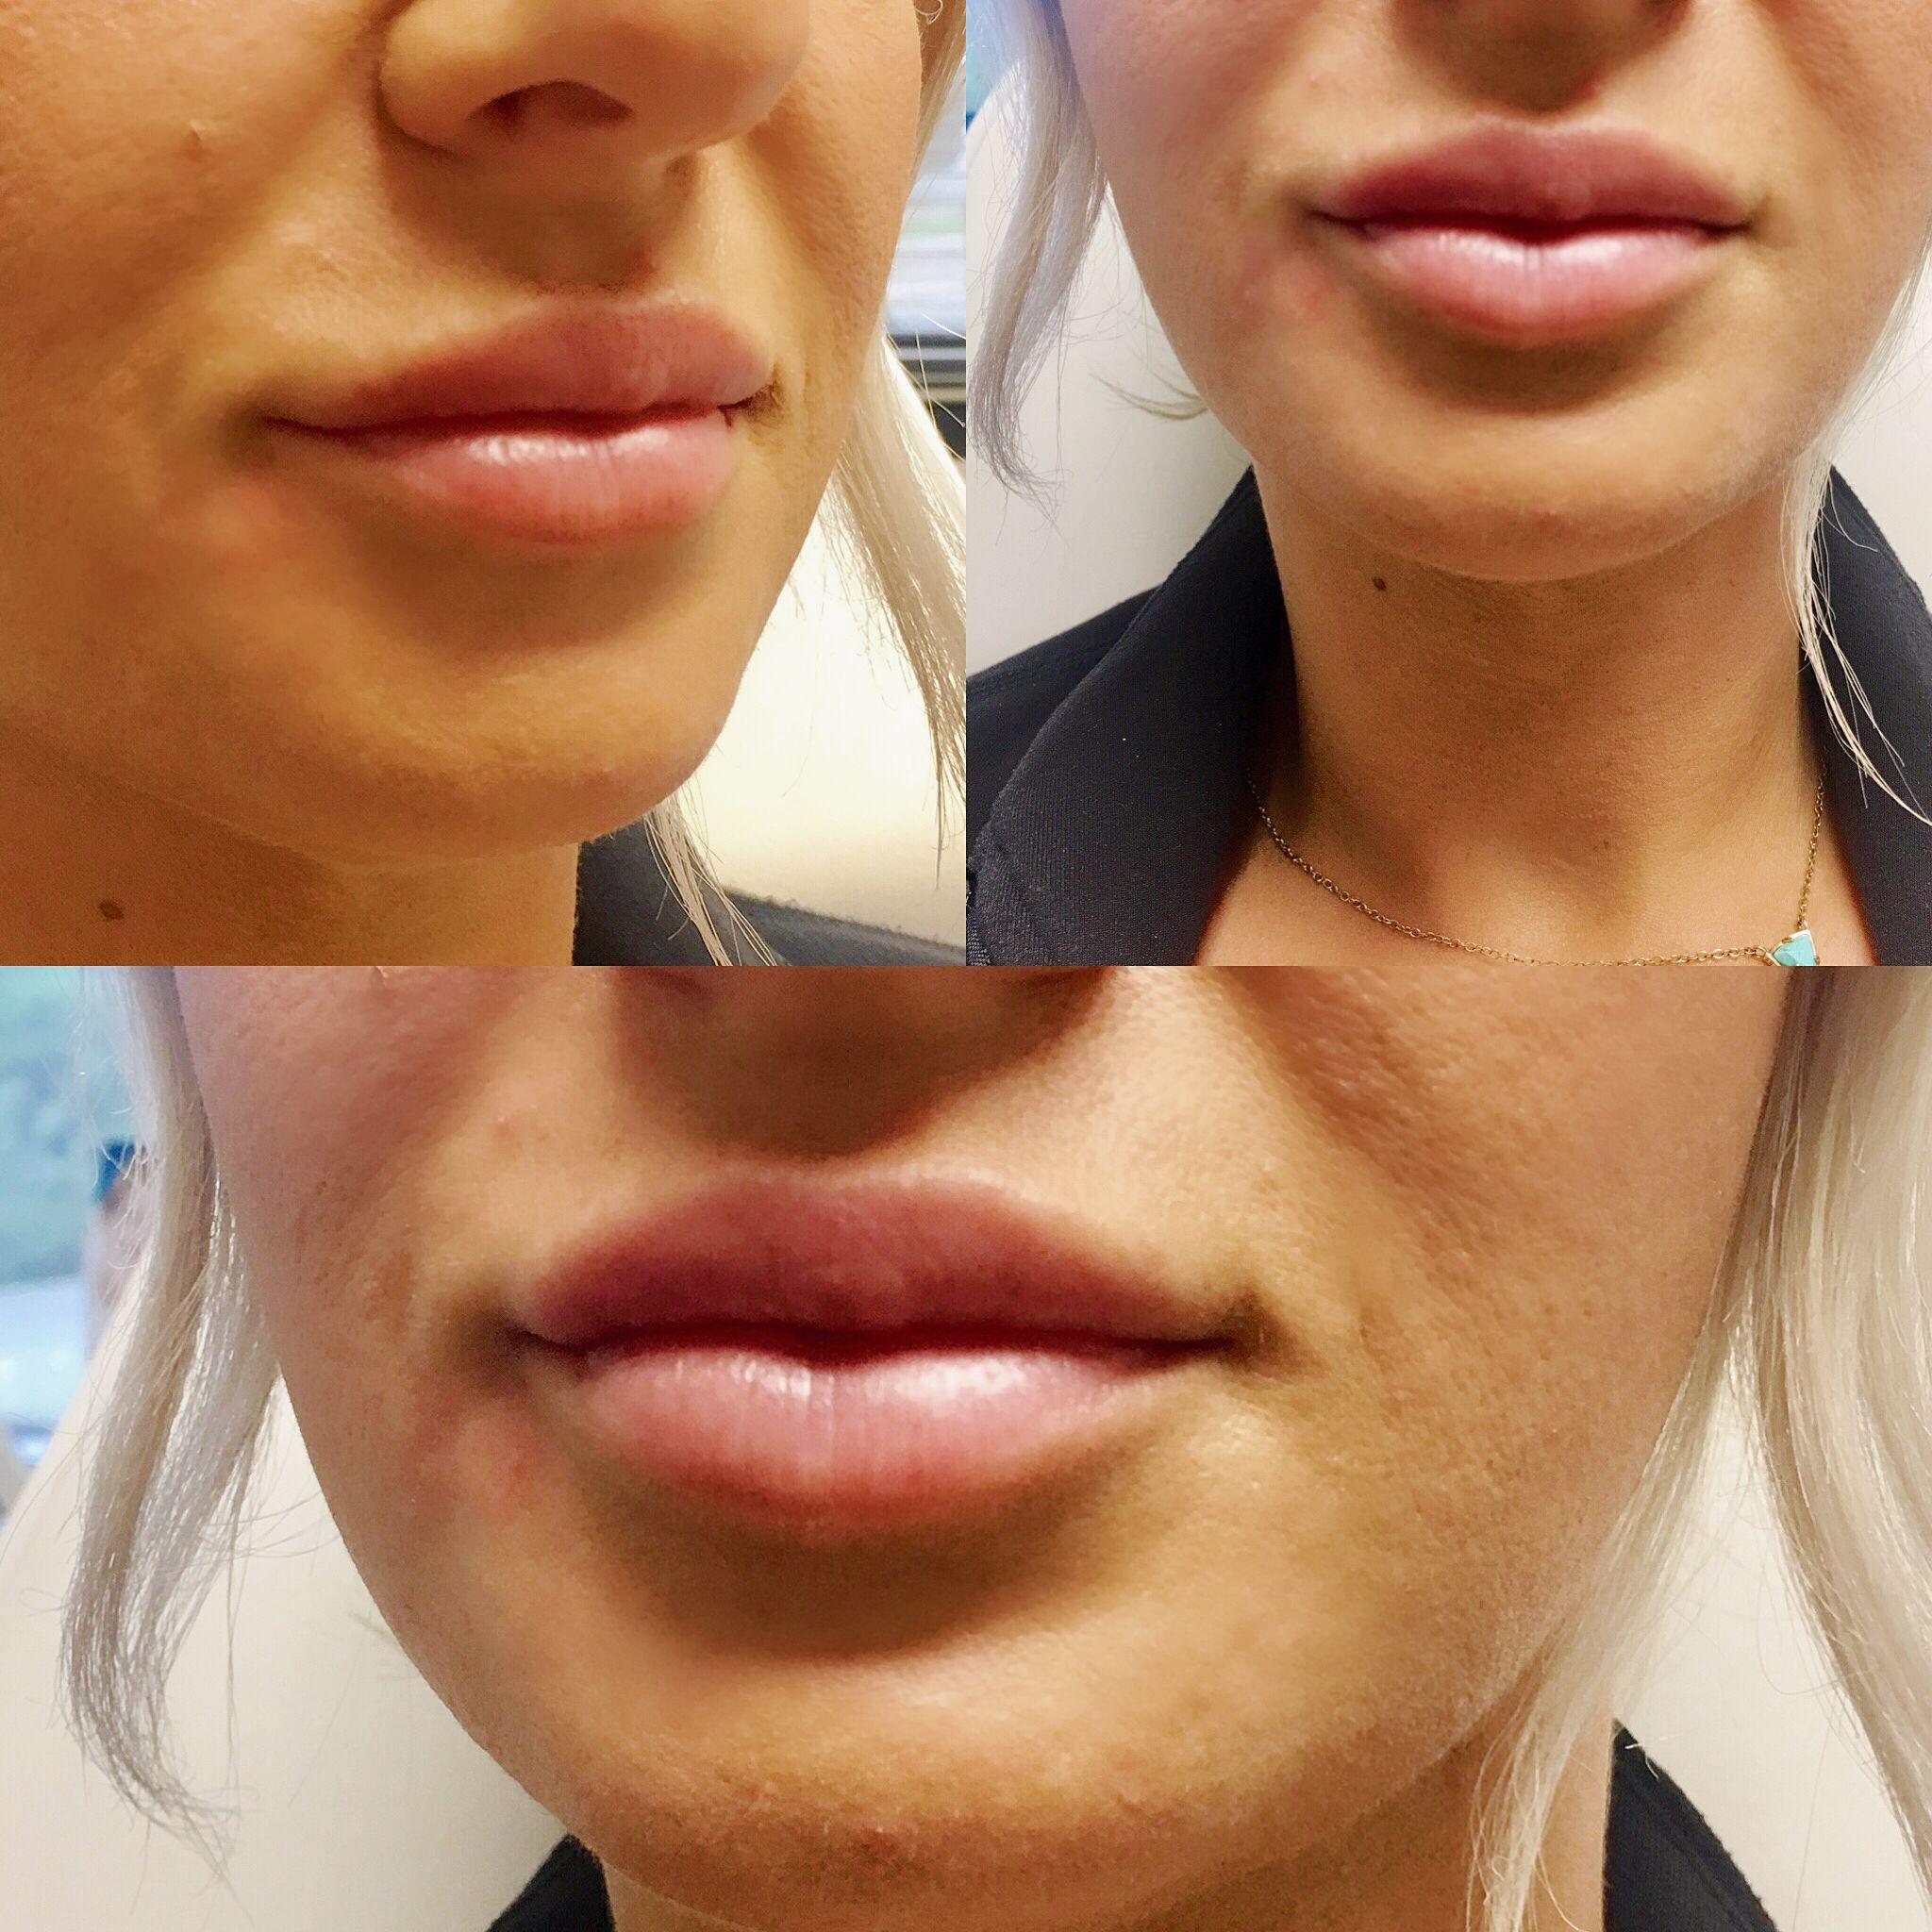 Professional Primp Juvederm lips, Juvederm